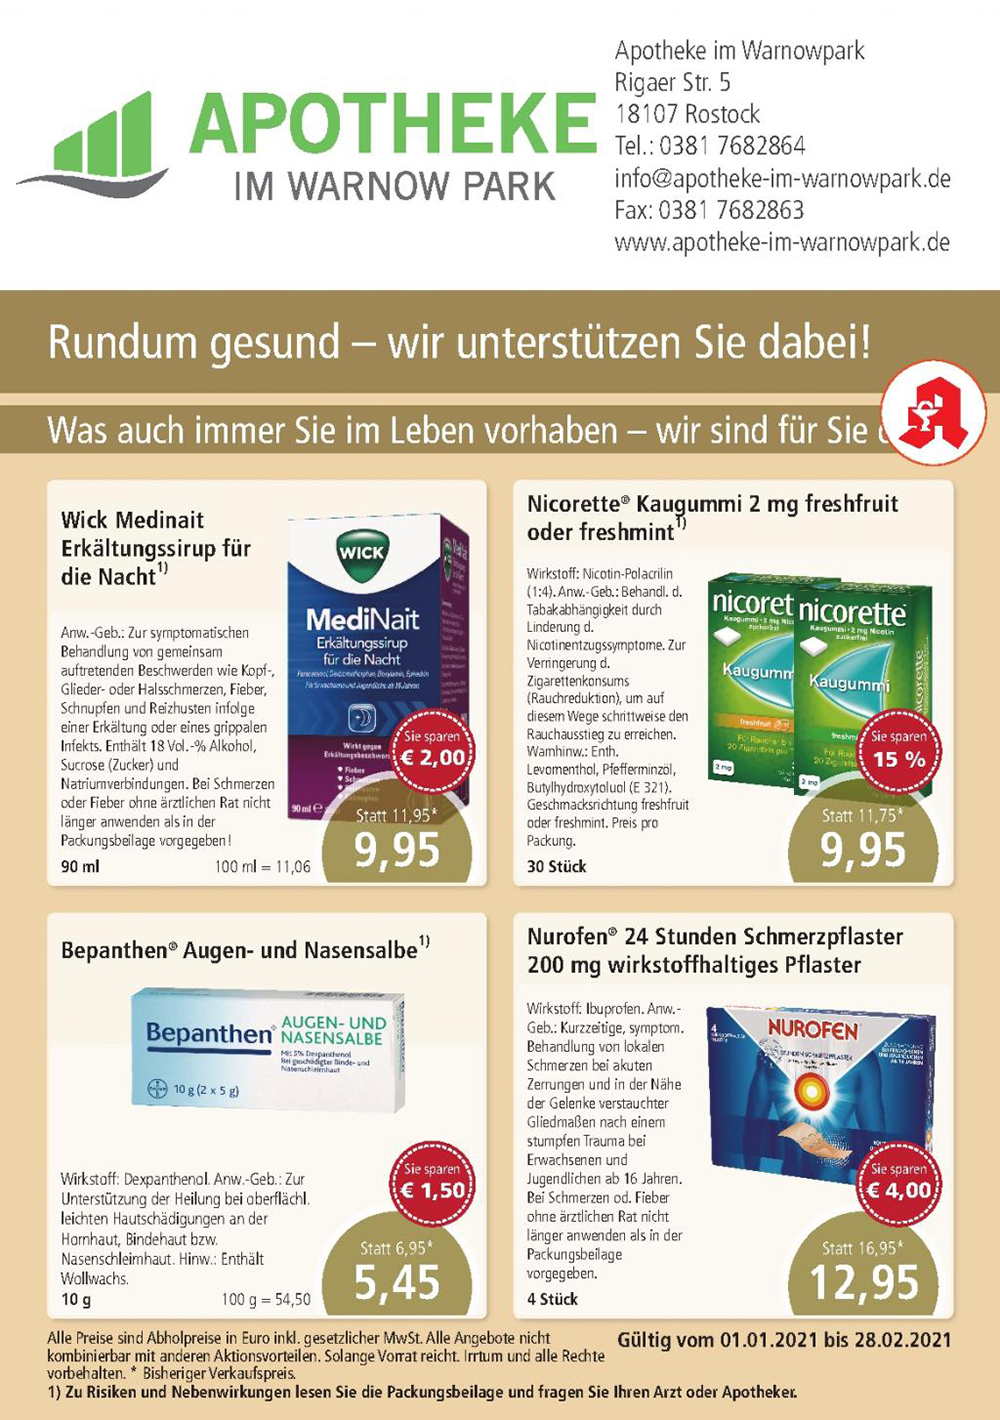 http://www.apotheken.de/fileadmin/clubarea/00000-Angebote/18107_im_warnnow_park_angebot_1.jpg